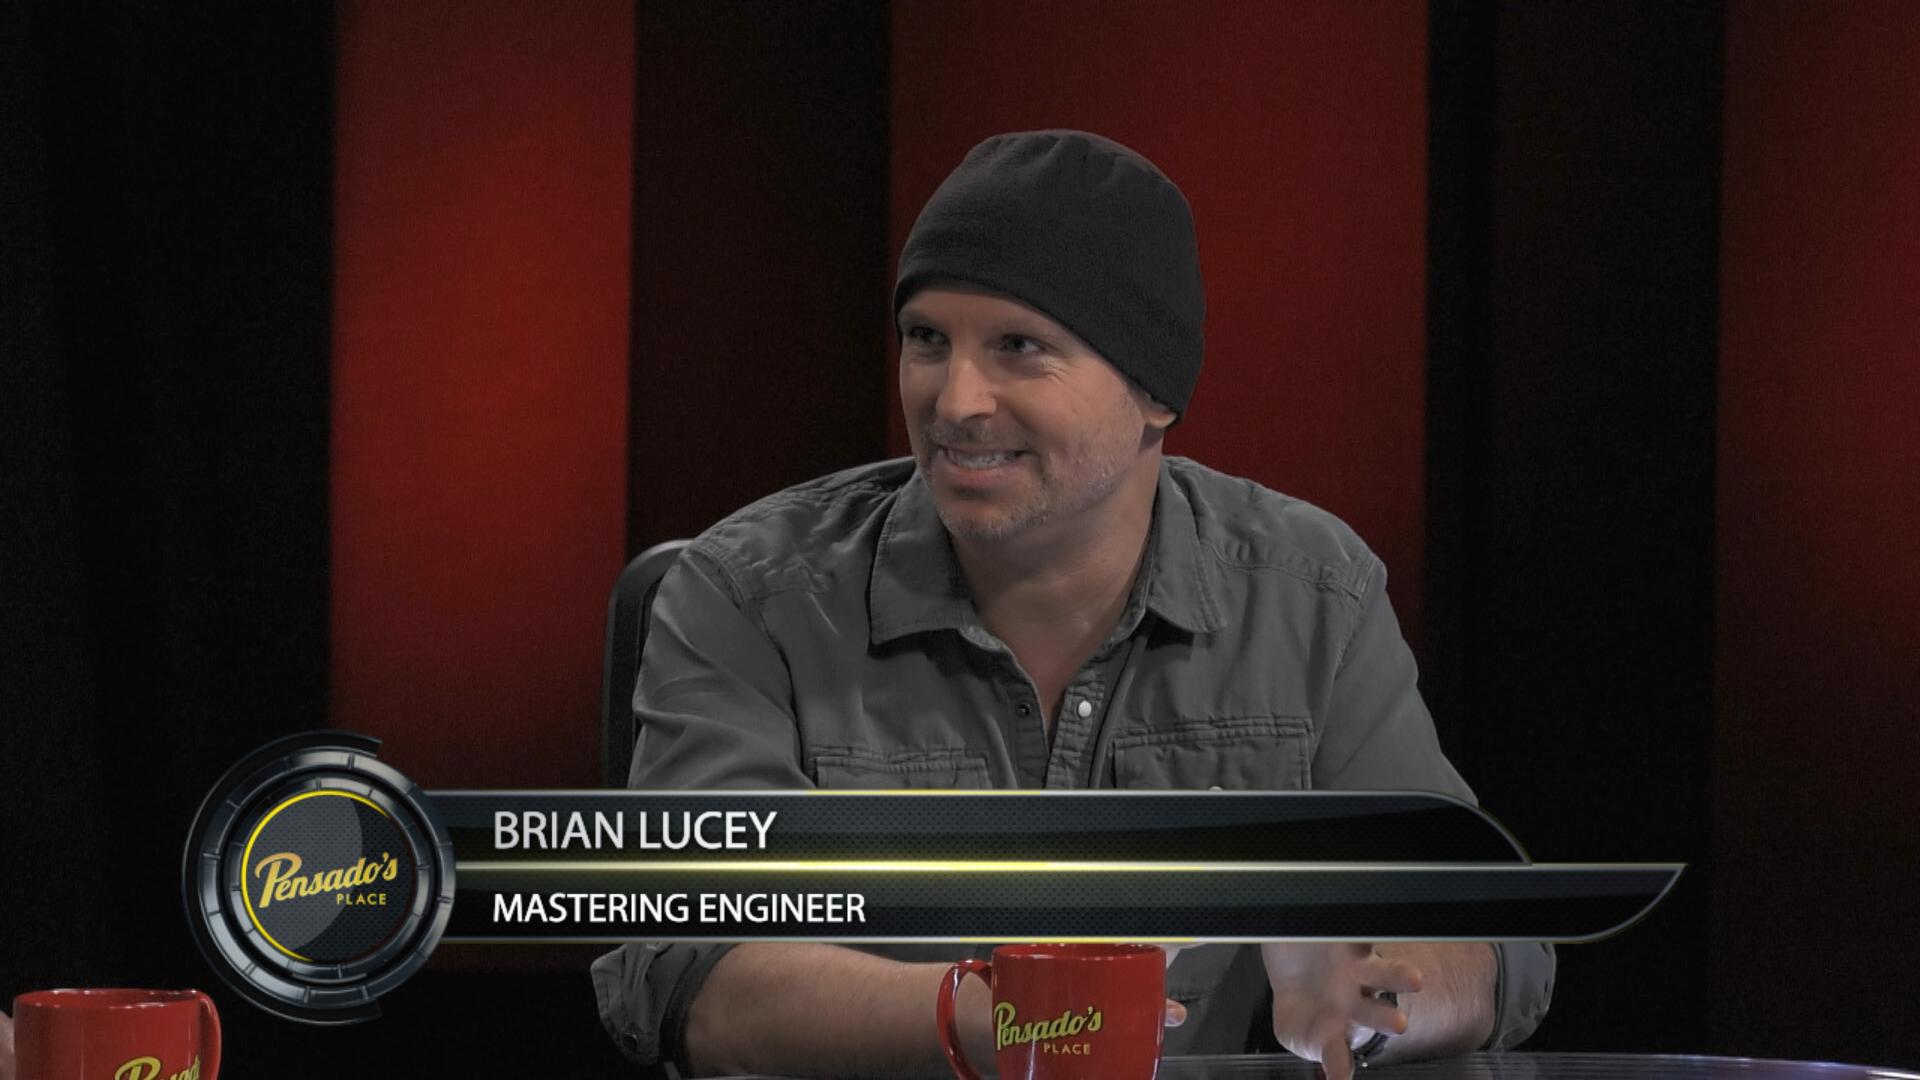 Brian Lucey Still Image